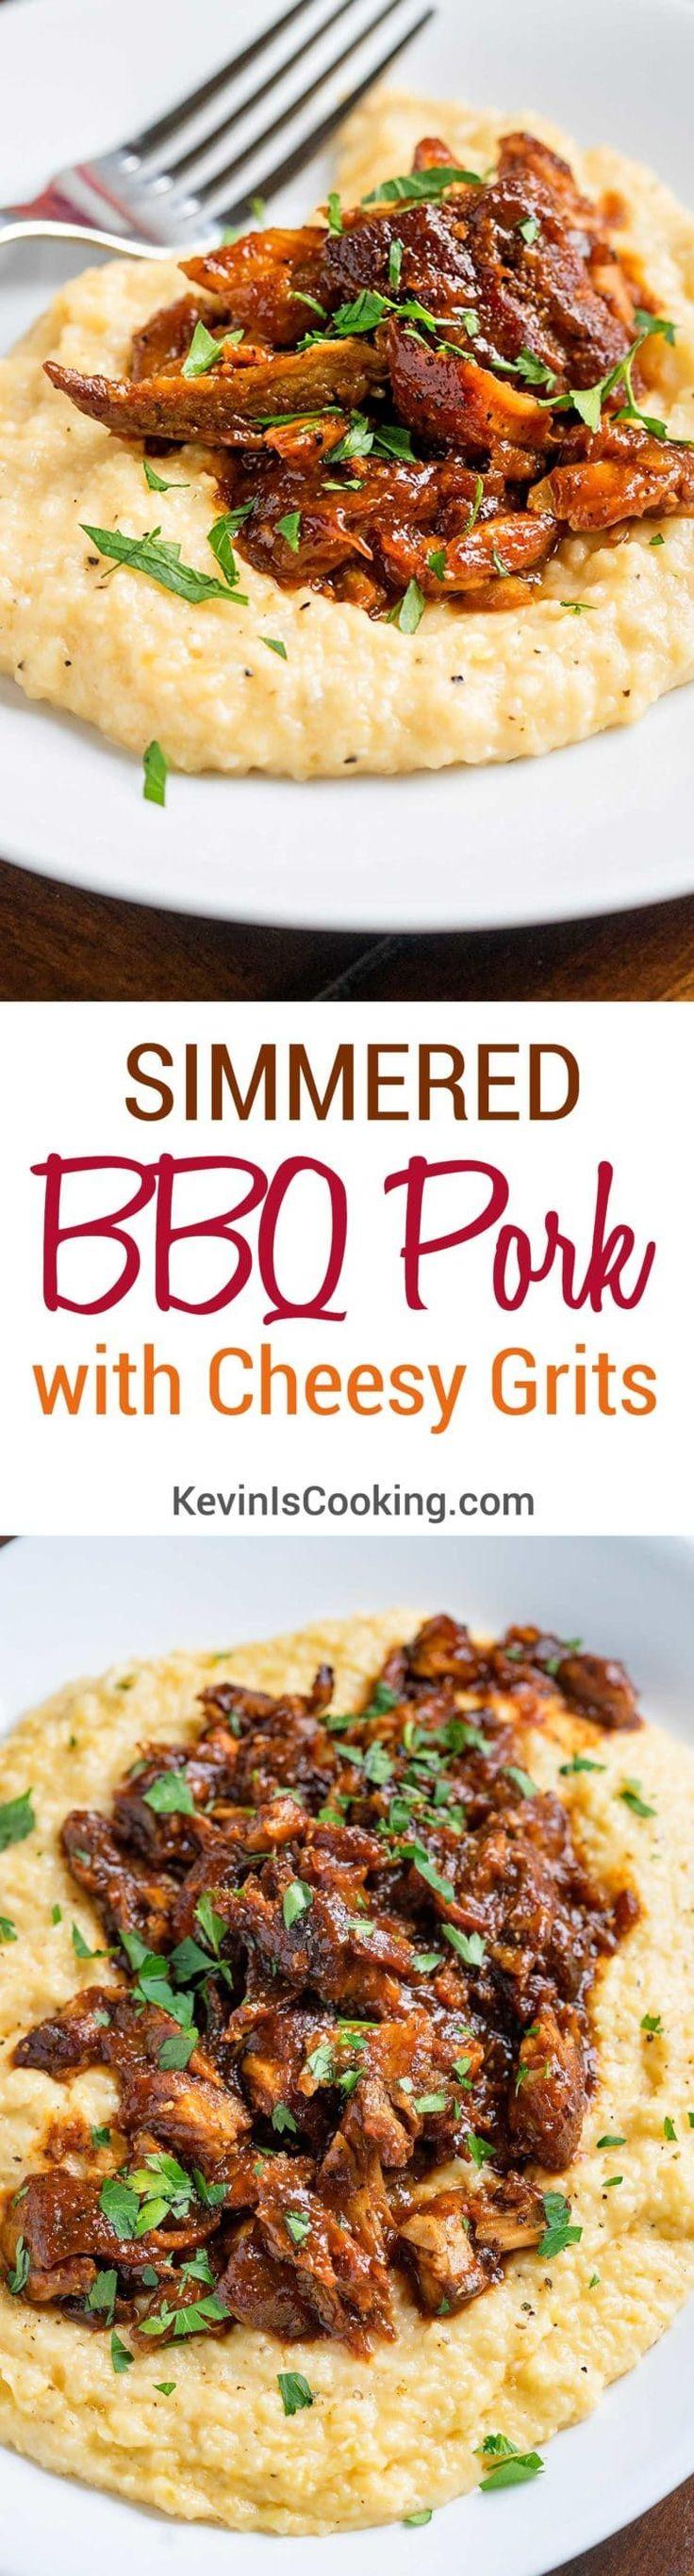 Best 25 Bbq Pork Ideas Only On Pinterest Pulled Pork Crockpot Pulled Pork And Easy Crockpot Pulled Pork